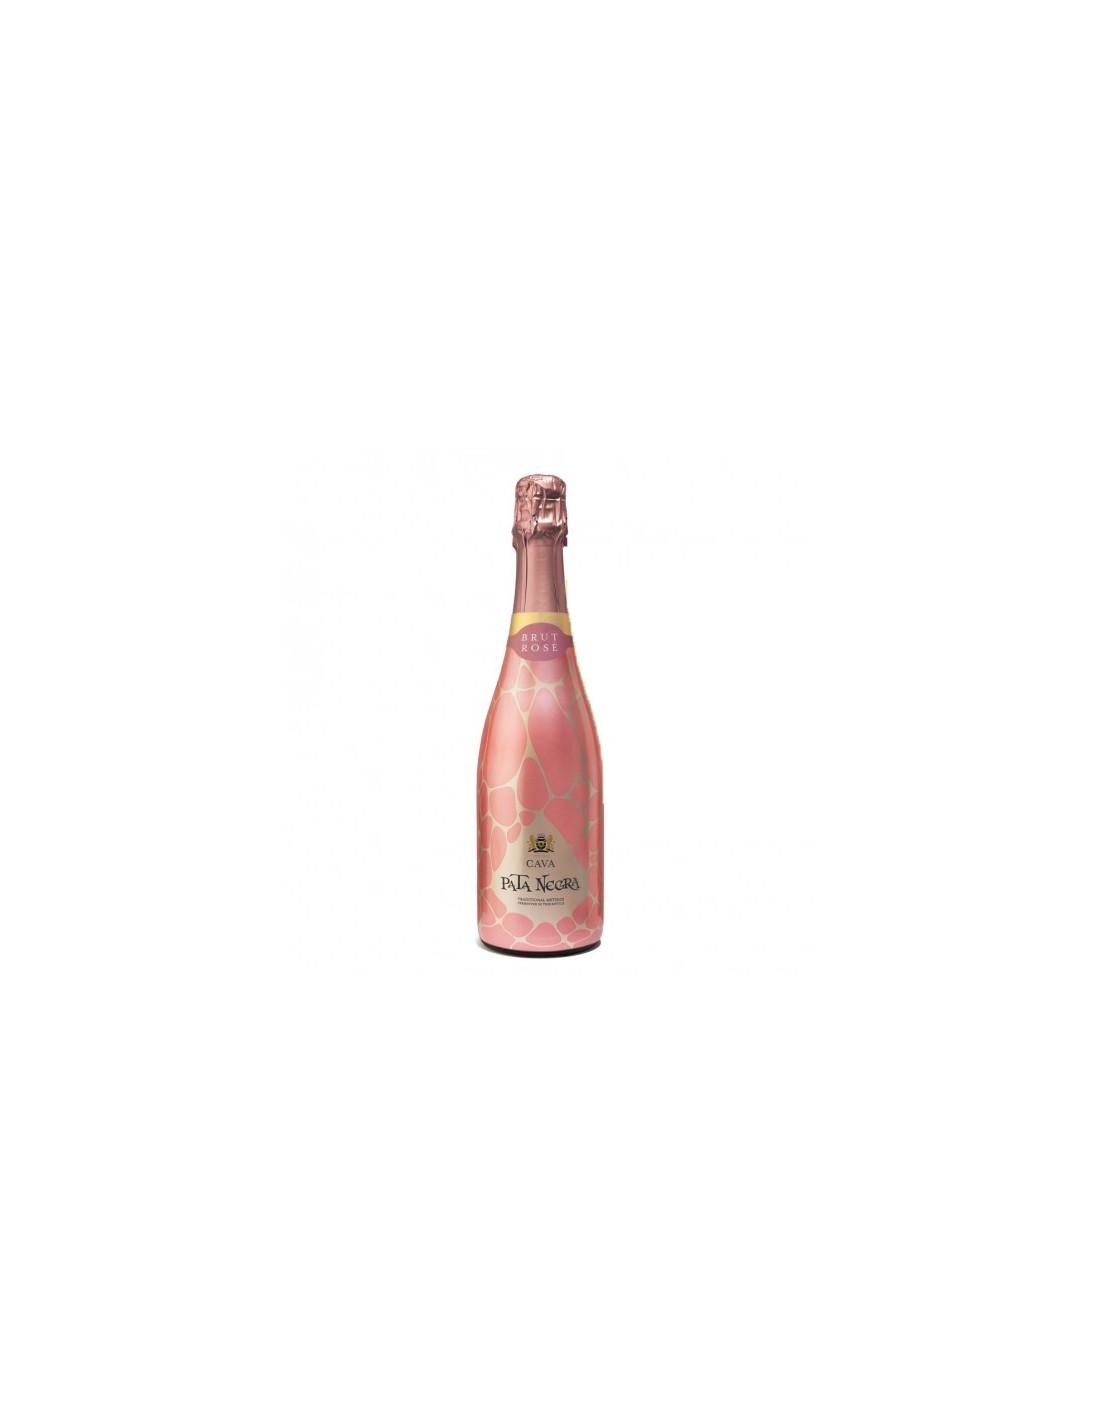 Vin spumant roze Pinot Noir, Pata Negra Cava, 0.75L, 11.50% alc., Spania